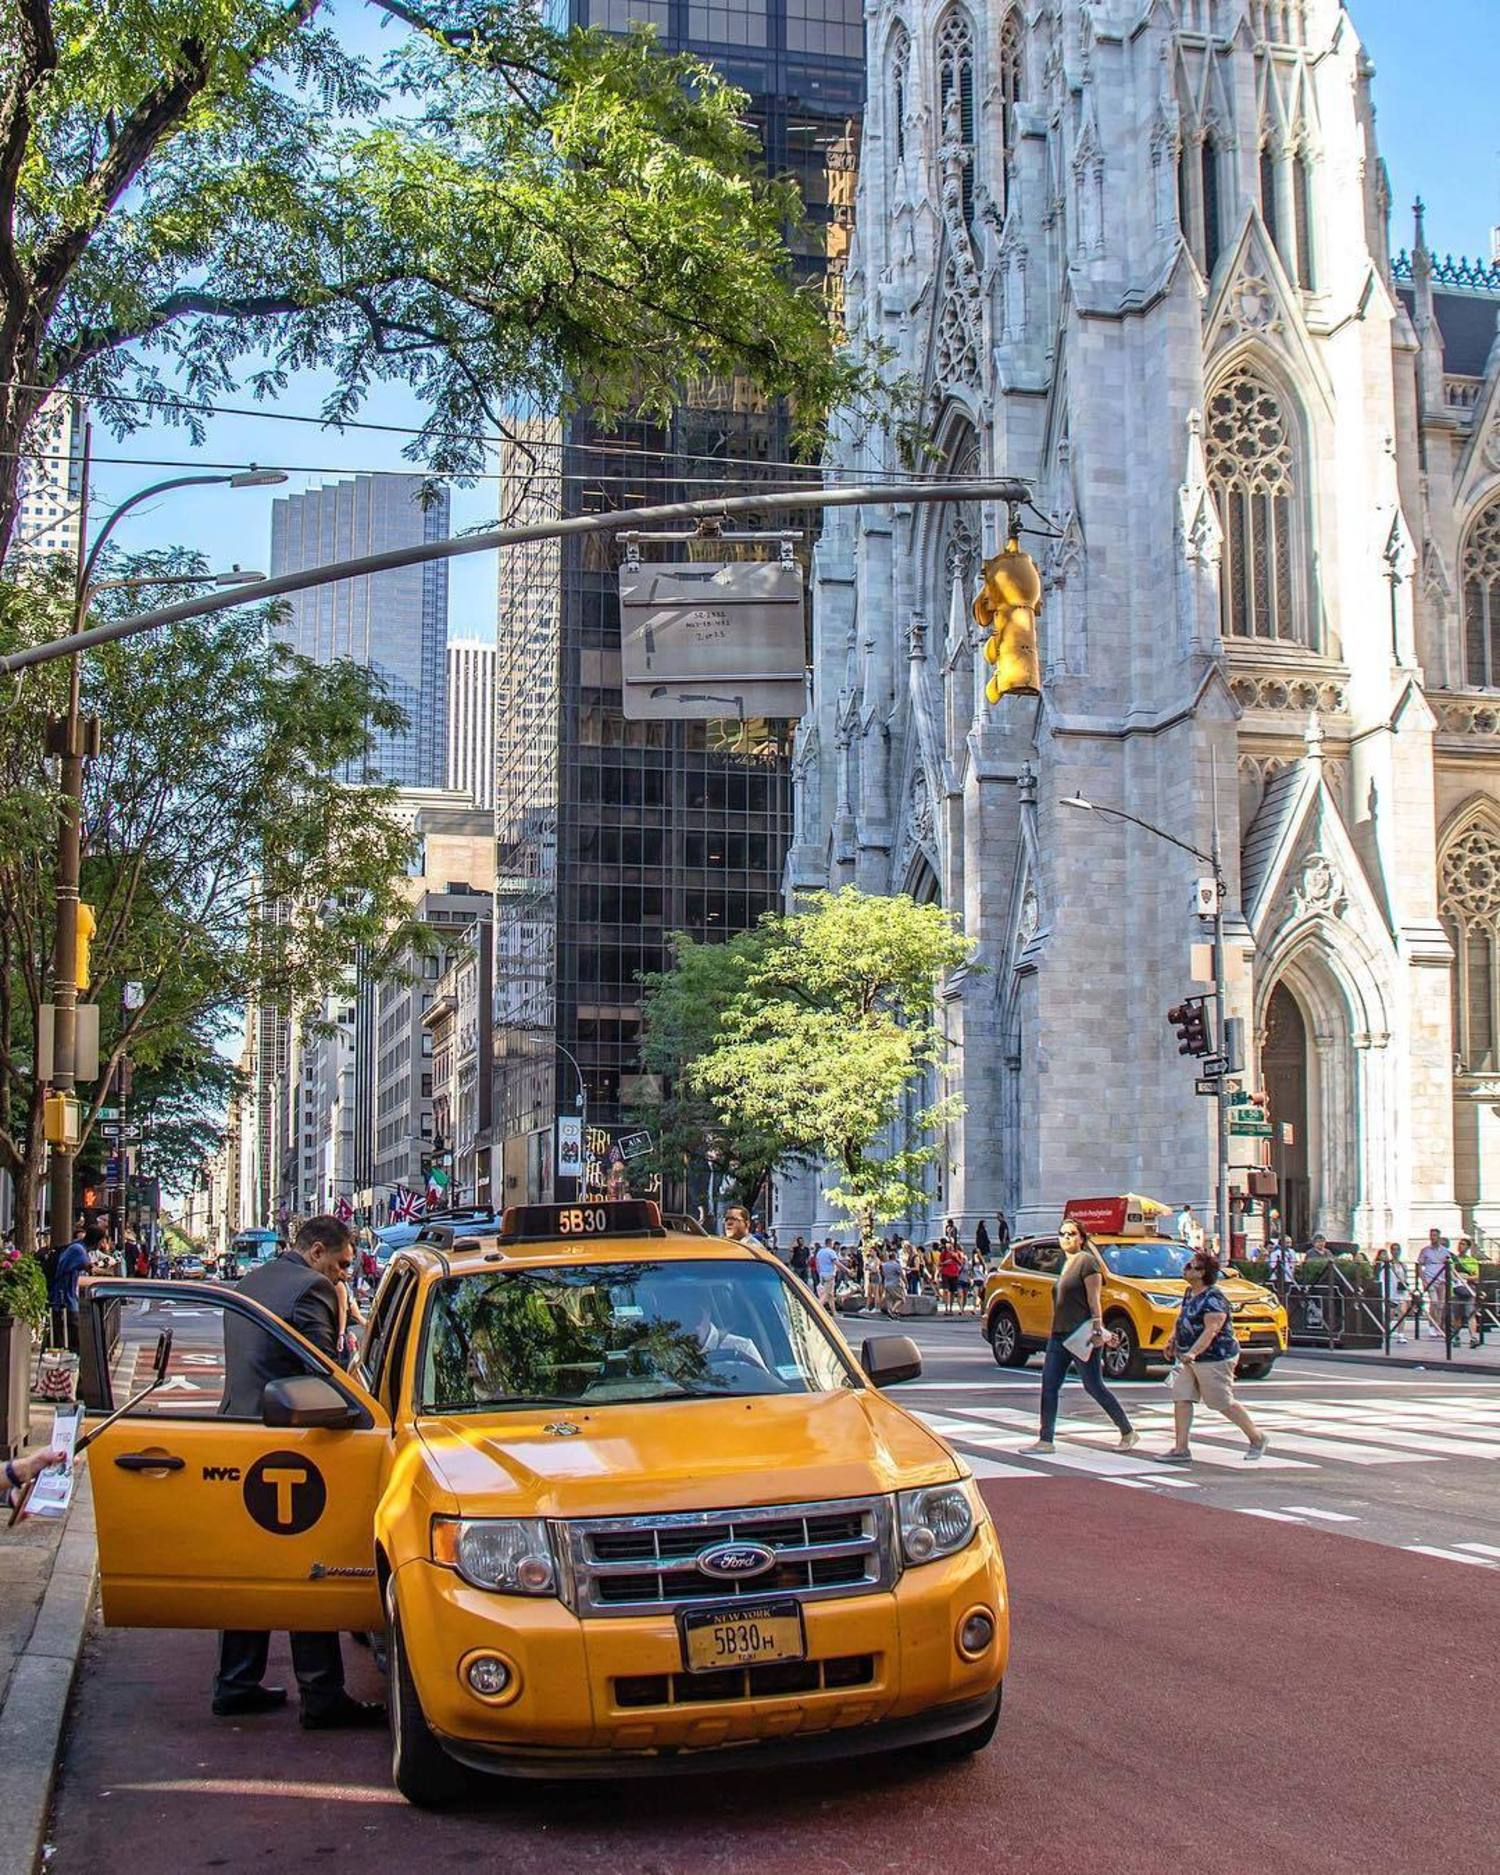 St Patricks Cathedral, Midtown, Manhattan